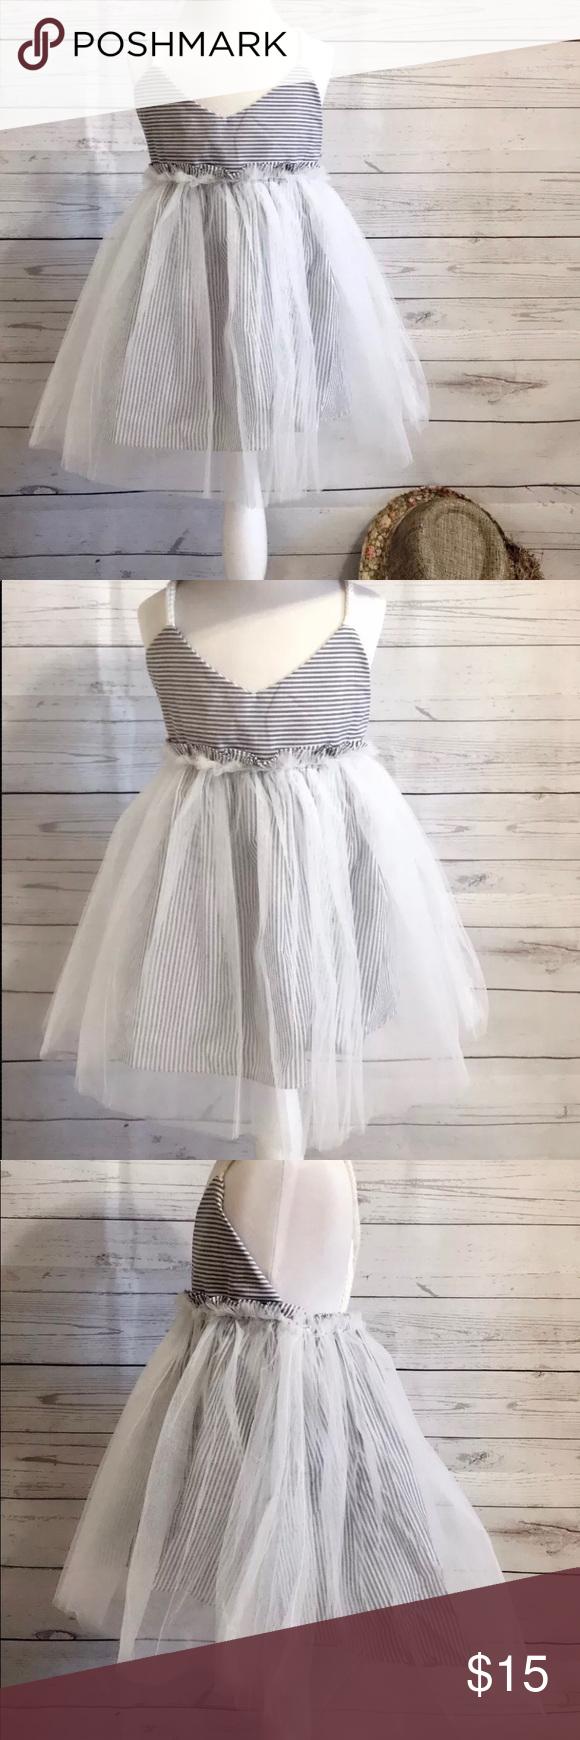 Nwt Little Girl Summer Beach Day Tutu Party Dress Dresses Summer Girls Party Dress [ 1740 x 580 Pixel ]